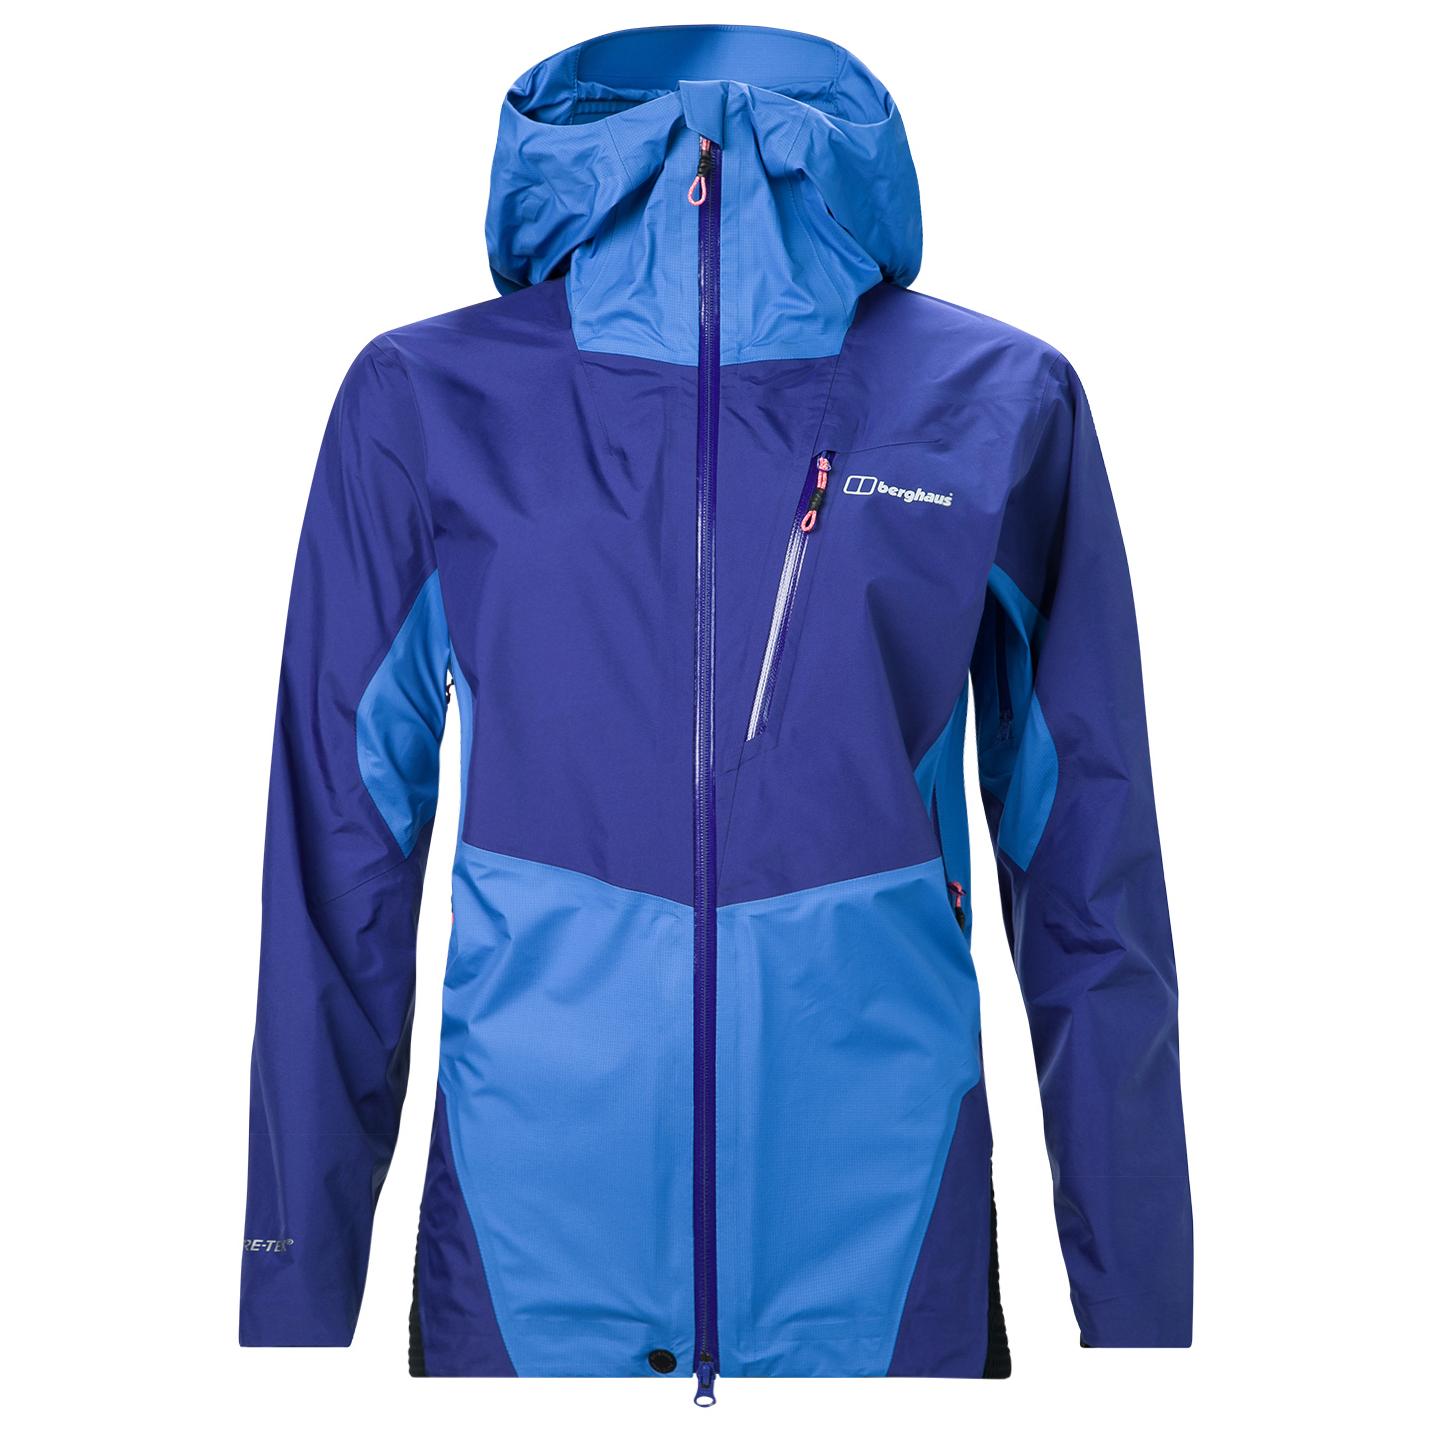 new concept ce8f6 25f5b Berghaus - Women's Changtse Shell Jacket - Waterproof jacket - Blue  Graphite / Carbon / Black | 8 (UK)